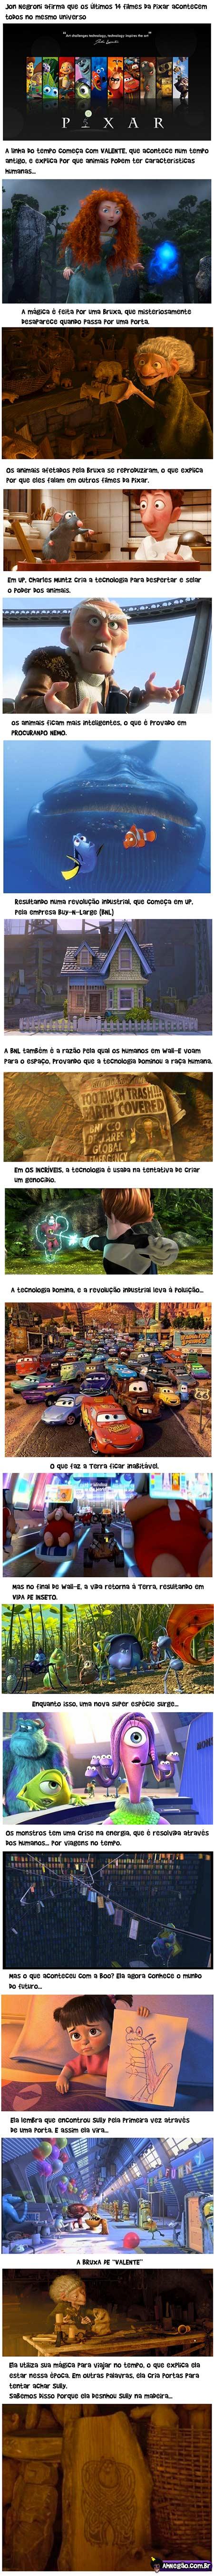 0 teoria pixar